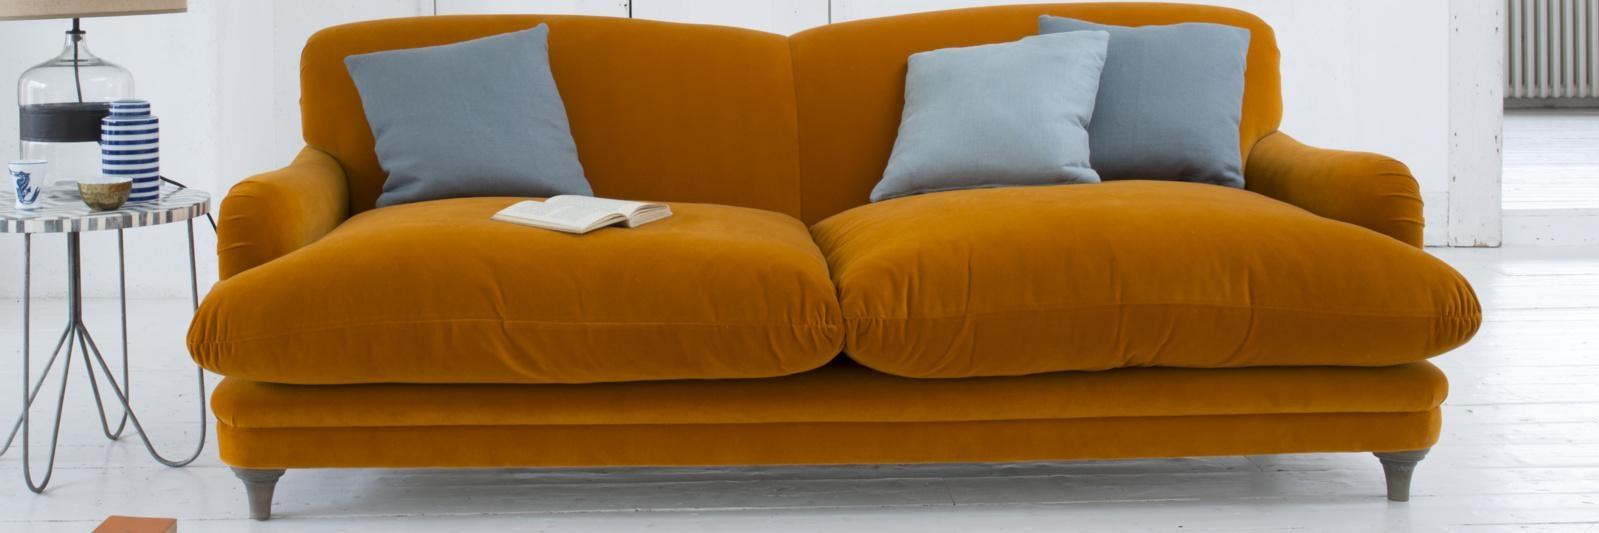 Orange Sofas – Home Design Ideas And Pictures For Burnt Orange Sofas (Image 9 of 20)